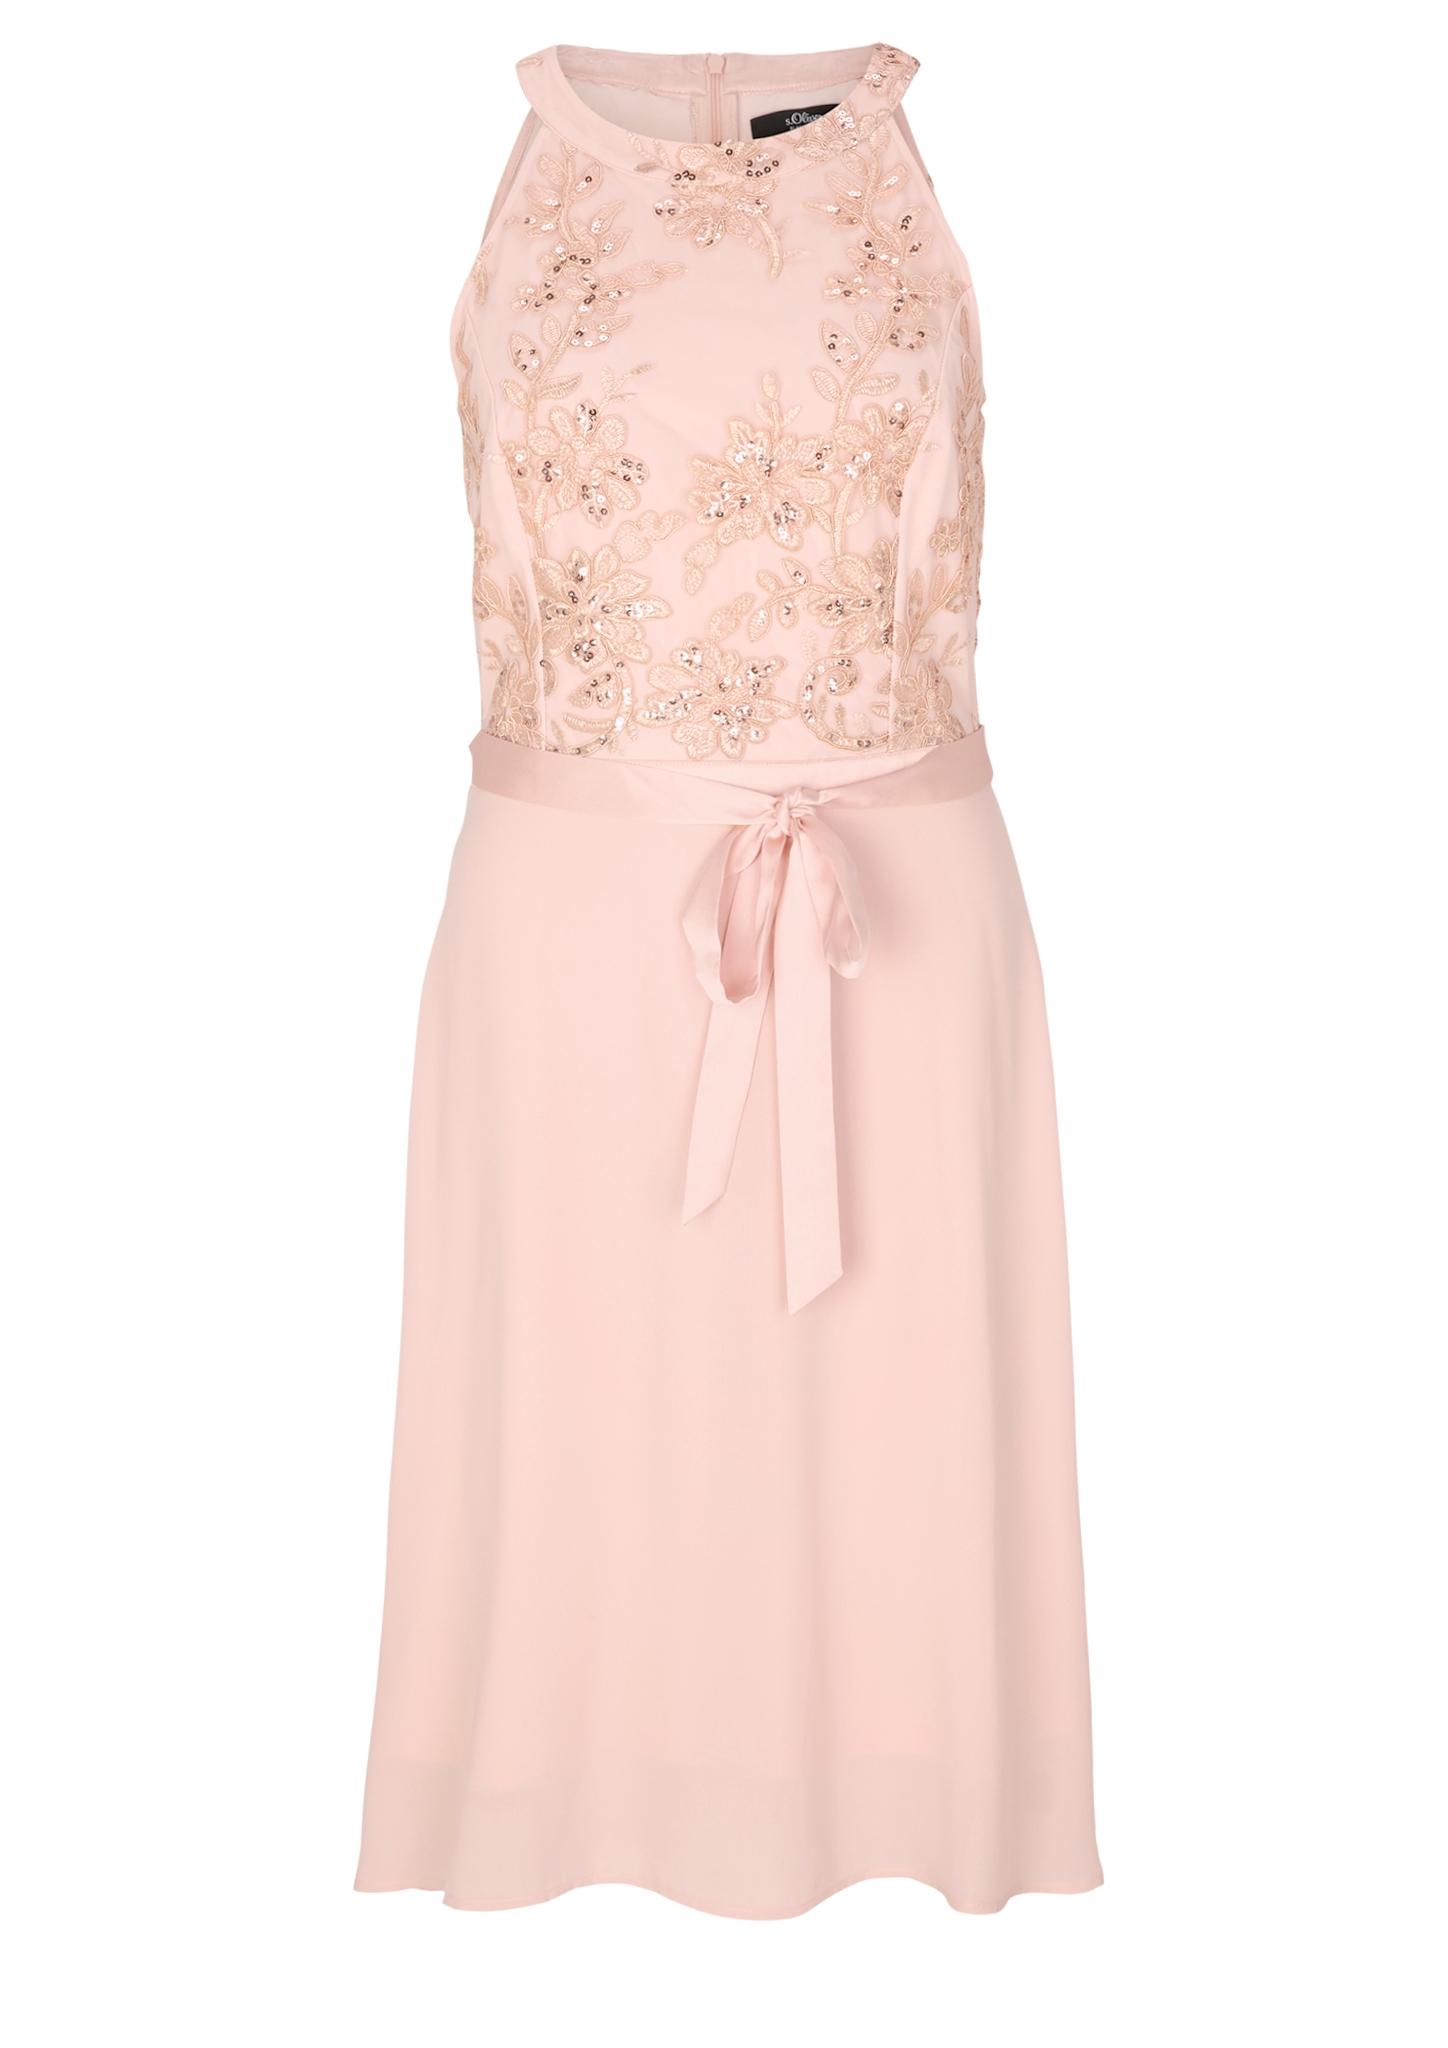 Party-Kleid | Bekleidung > Kleider > Partykleider | Rosa | Oberstoff a: 100% polyester| oberstoff b: 100% polyamid| futter: 100% polyester | s.Oliver BLACK LABEL